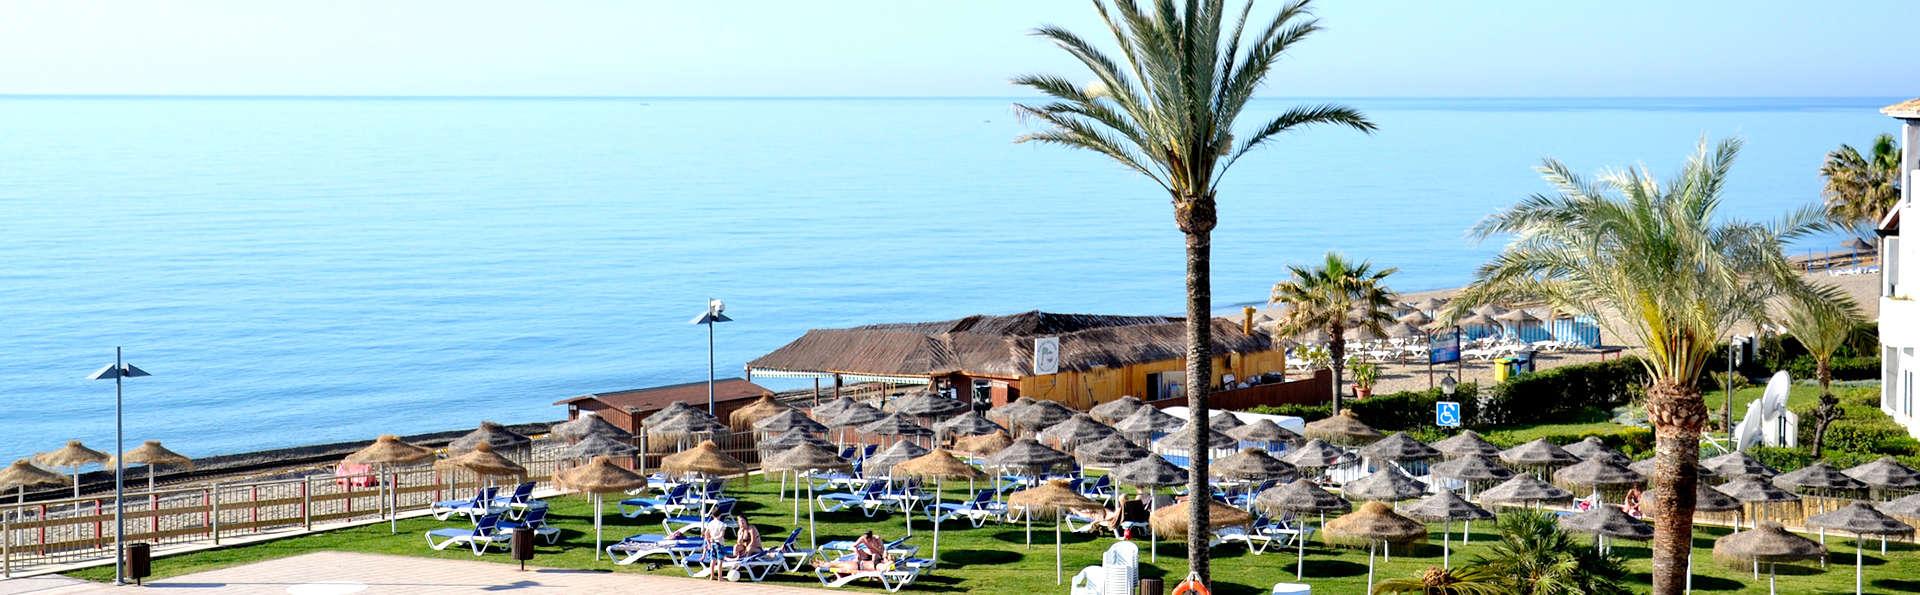 Demi-pension sur la plage de La Calas de Mijas à Málaga